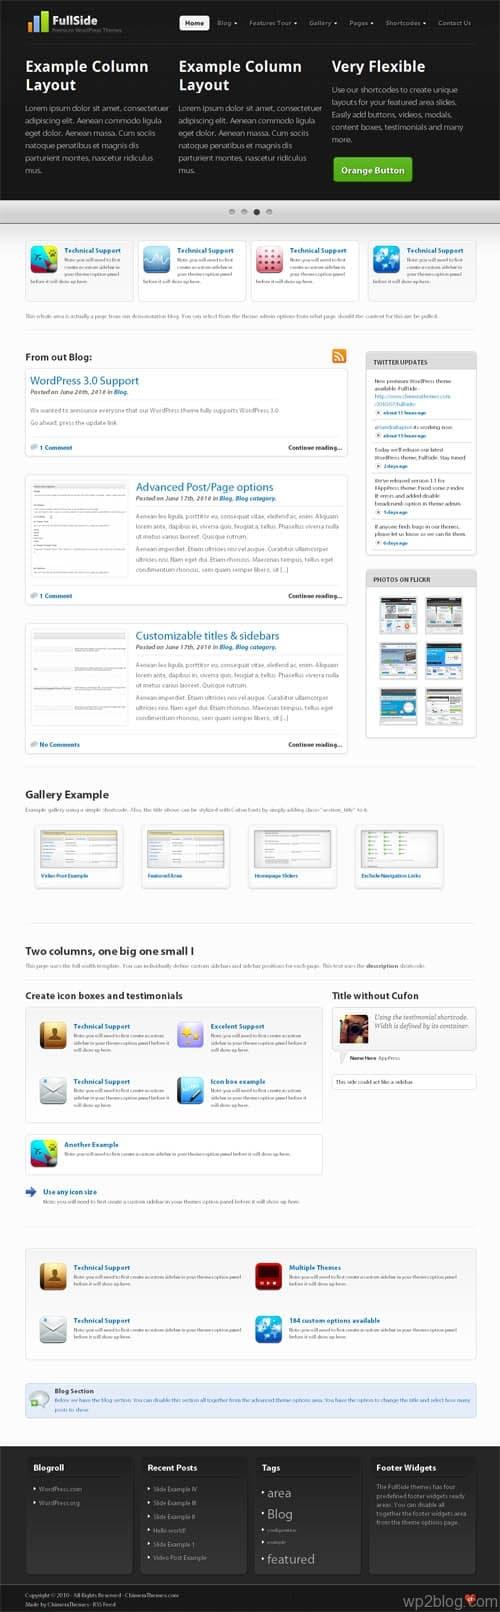 fullslide wordpress theme